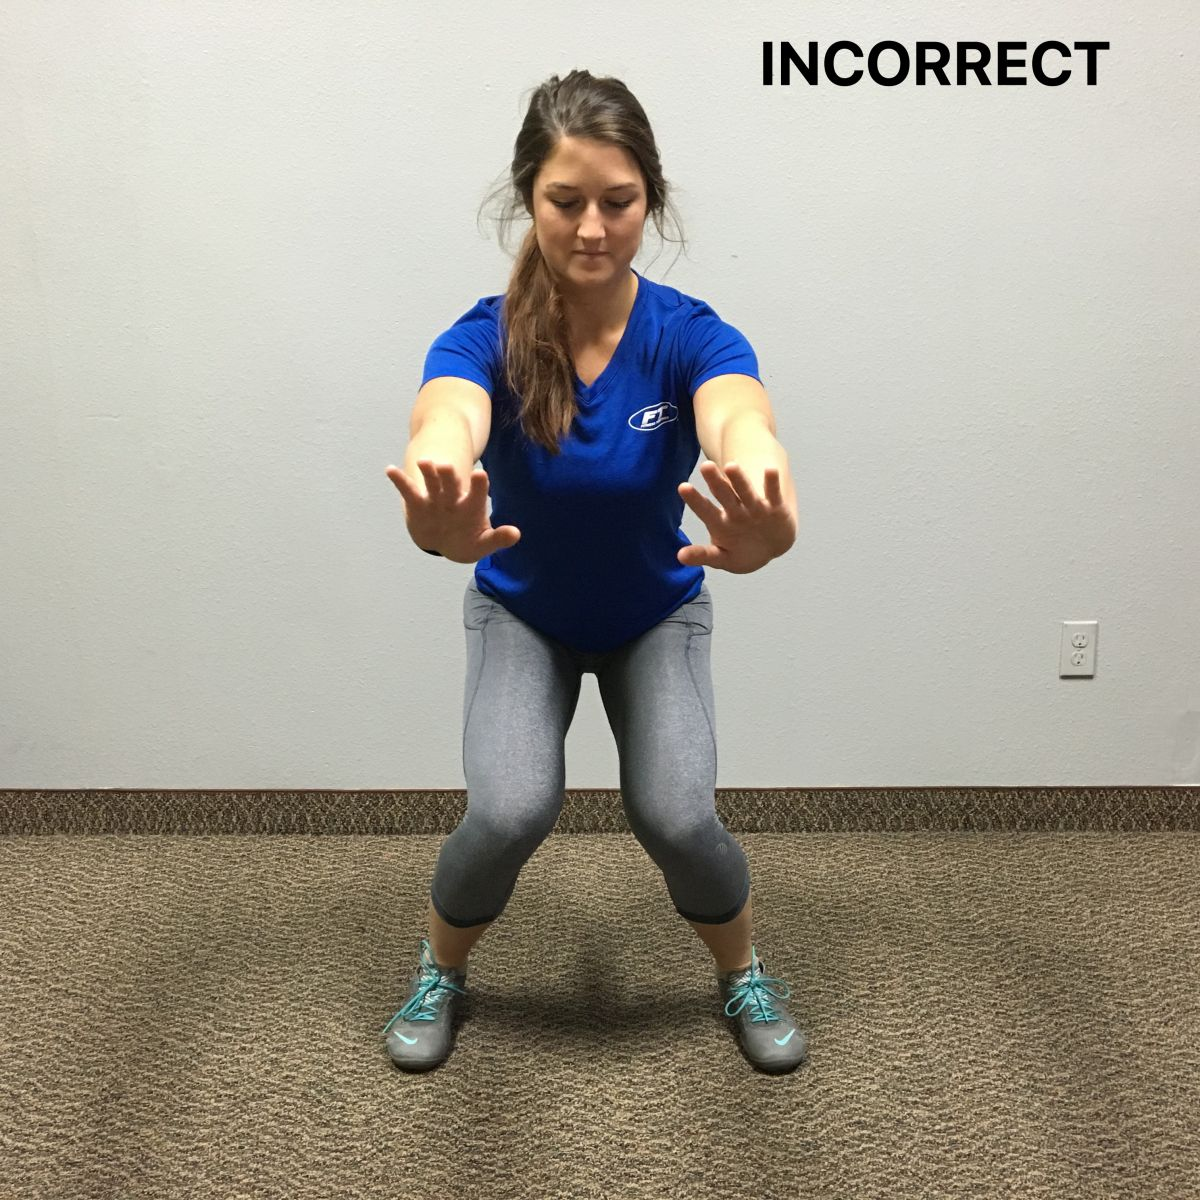 incorrect squat position